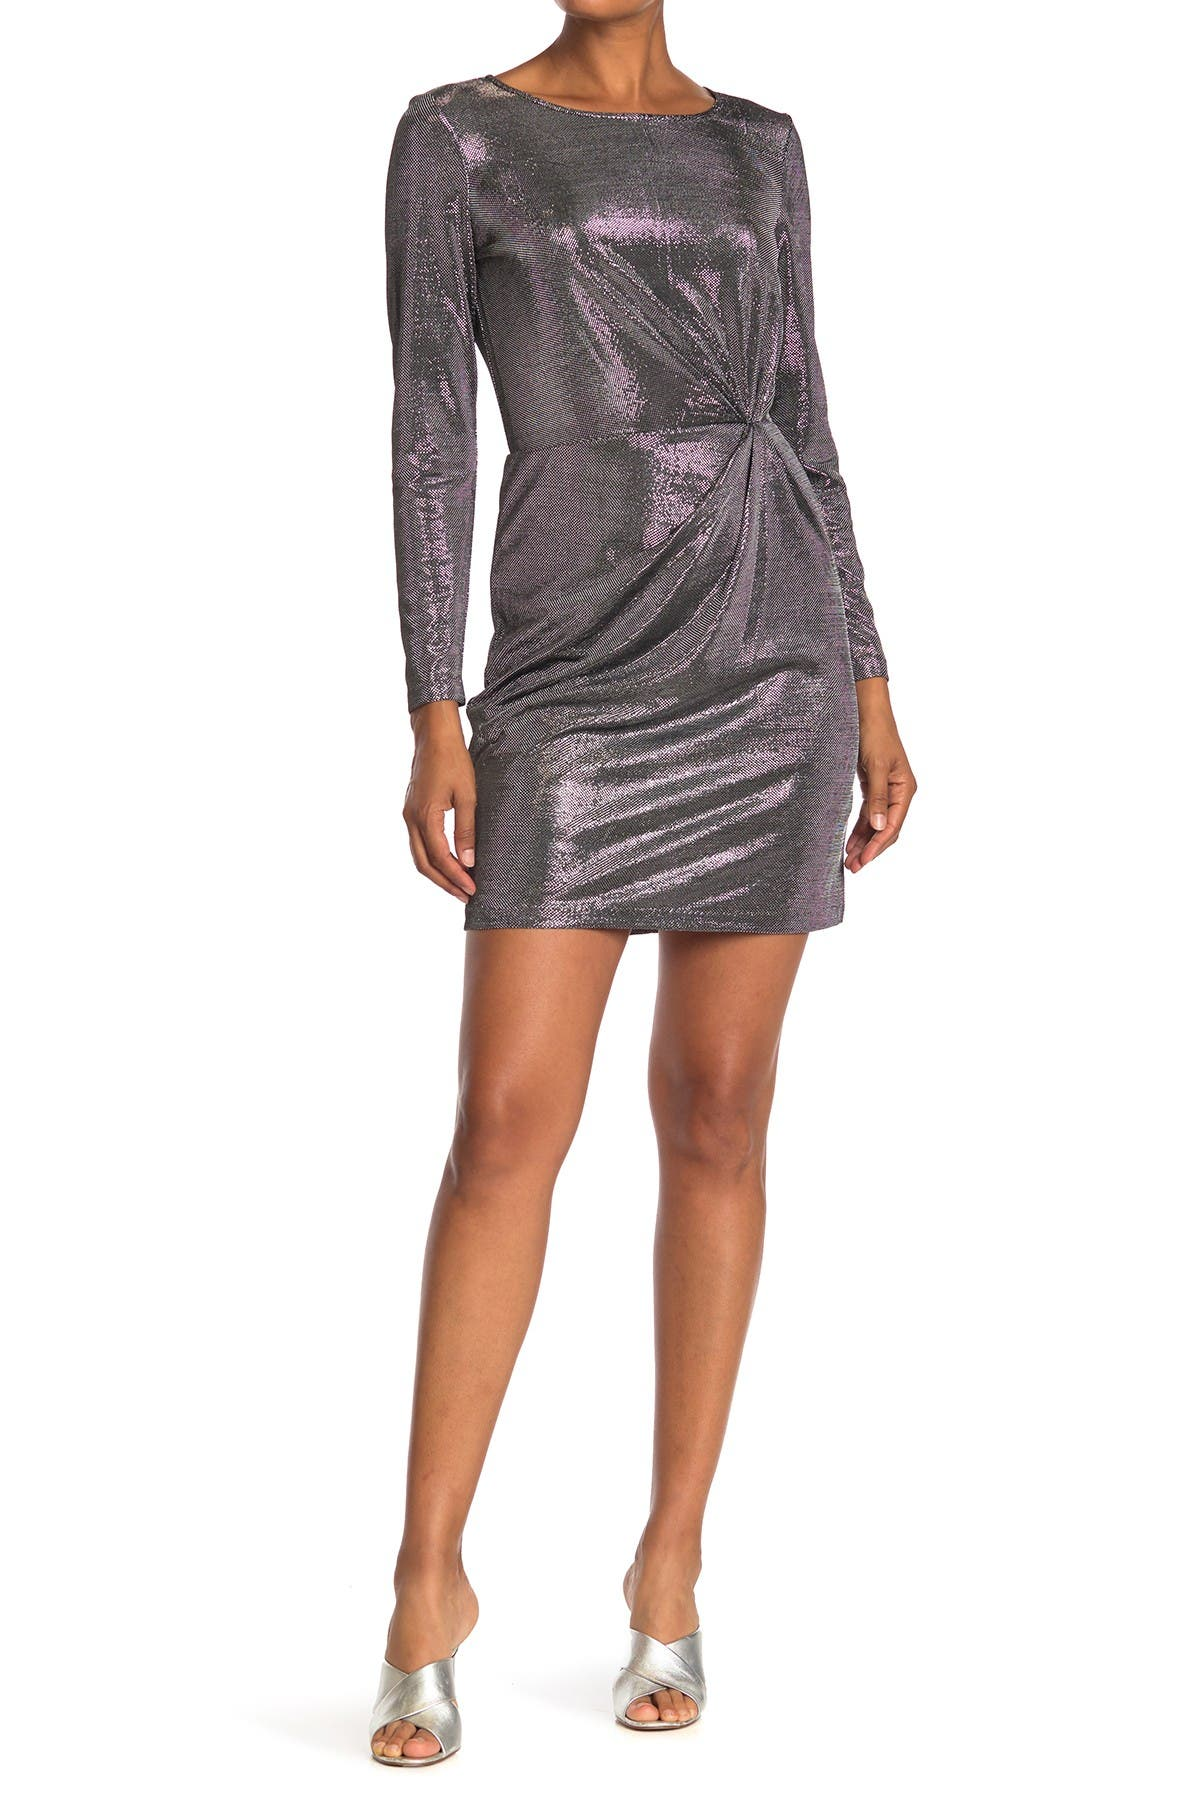 Image of BB Dakota What's Your Shine Metallic Mini Dress